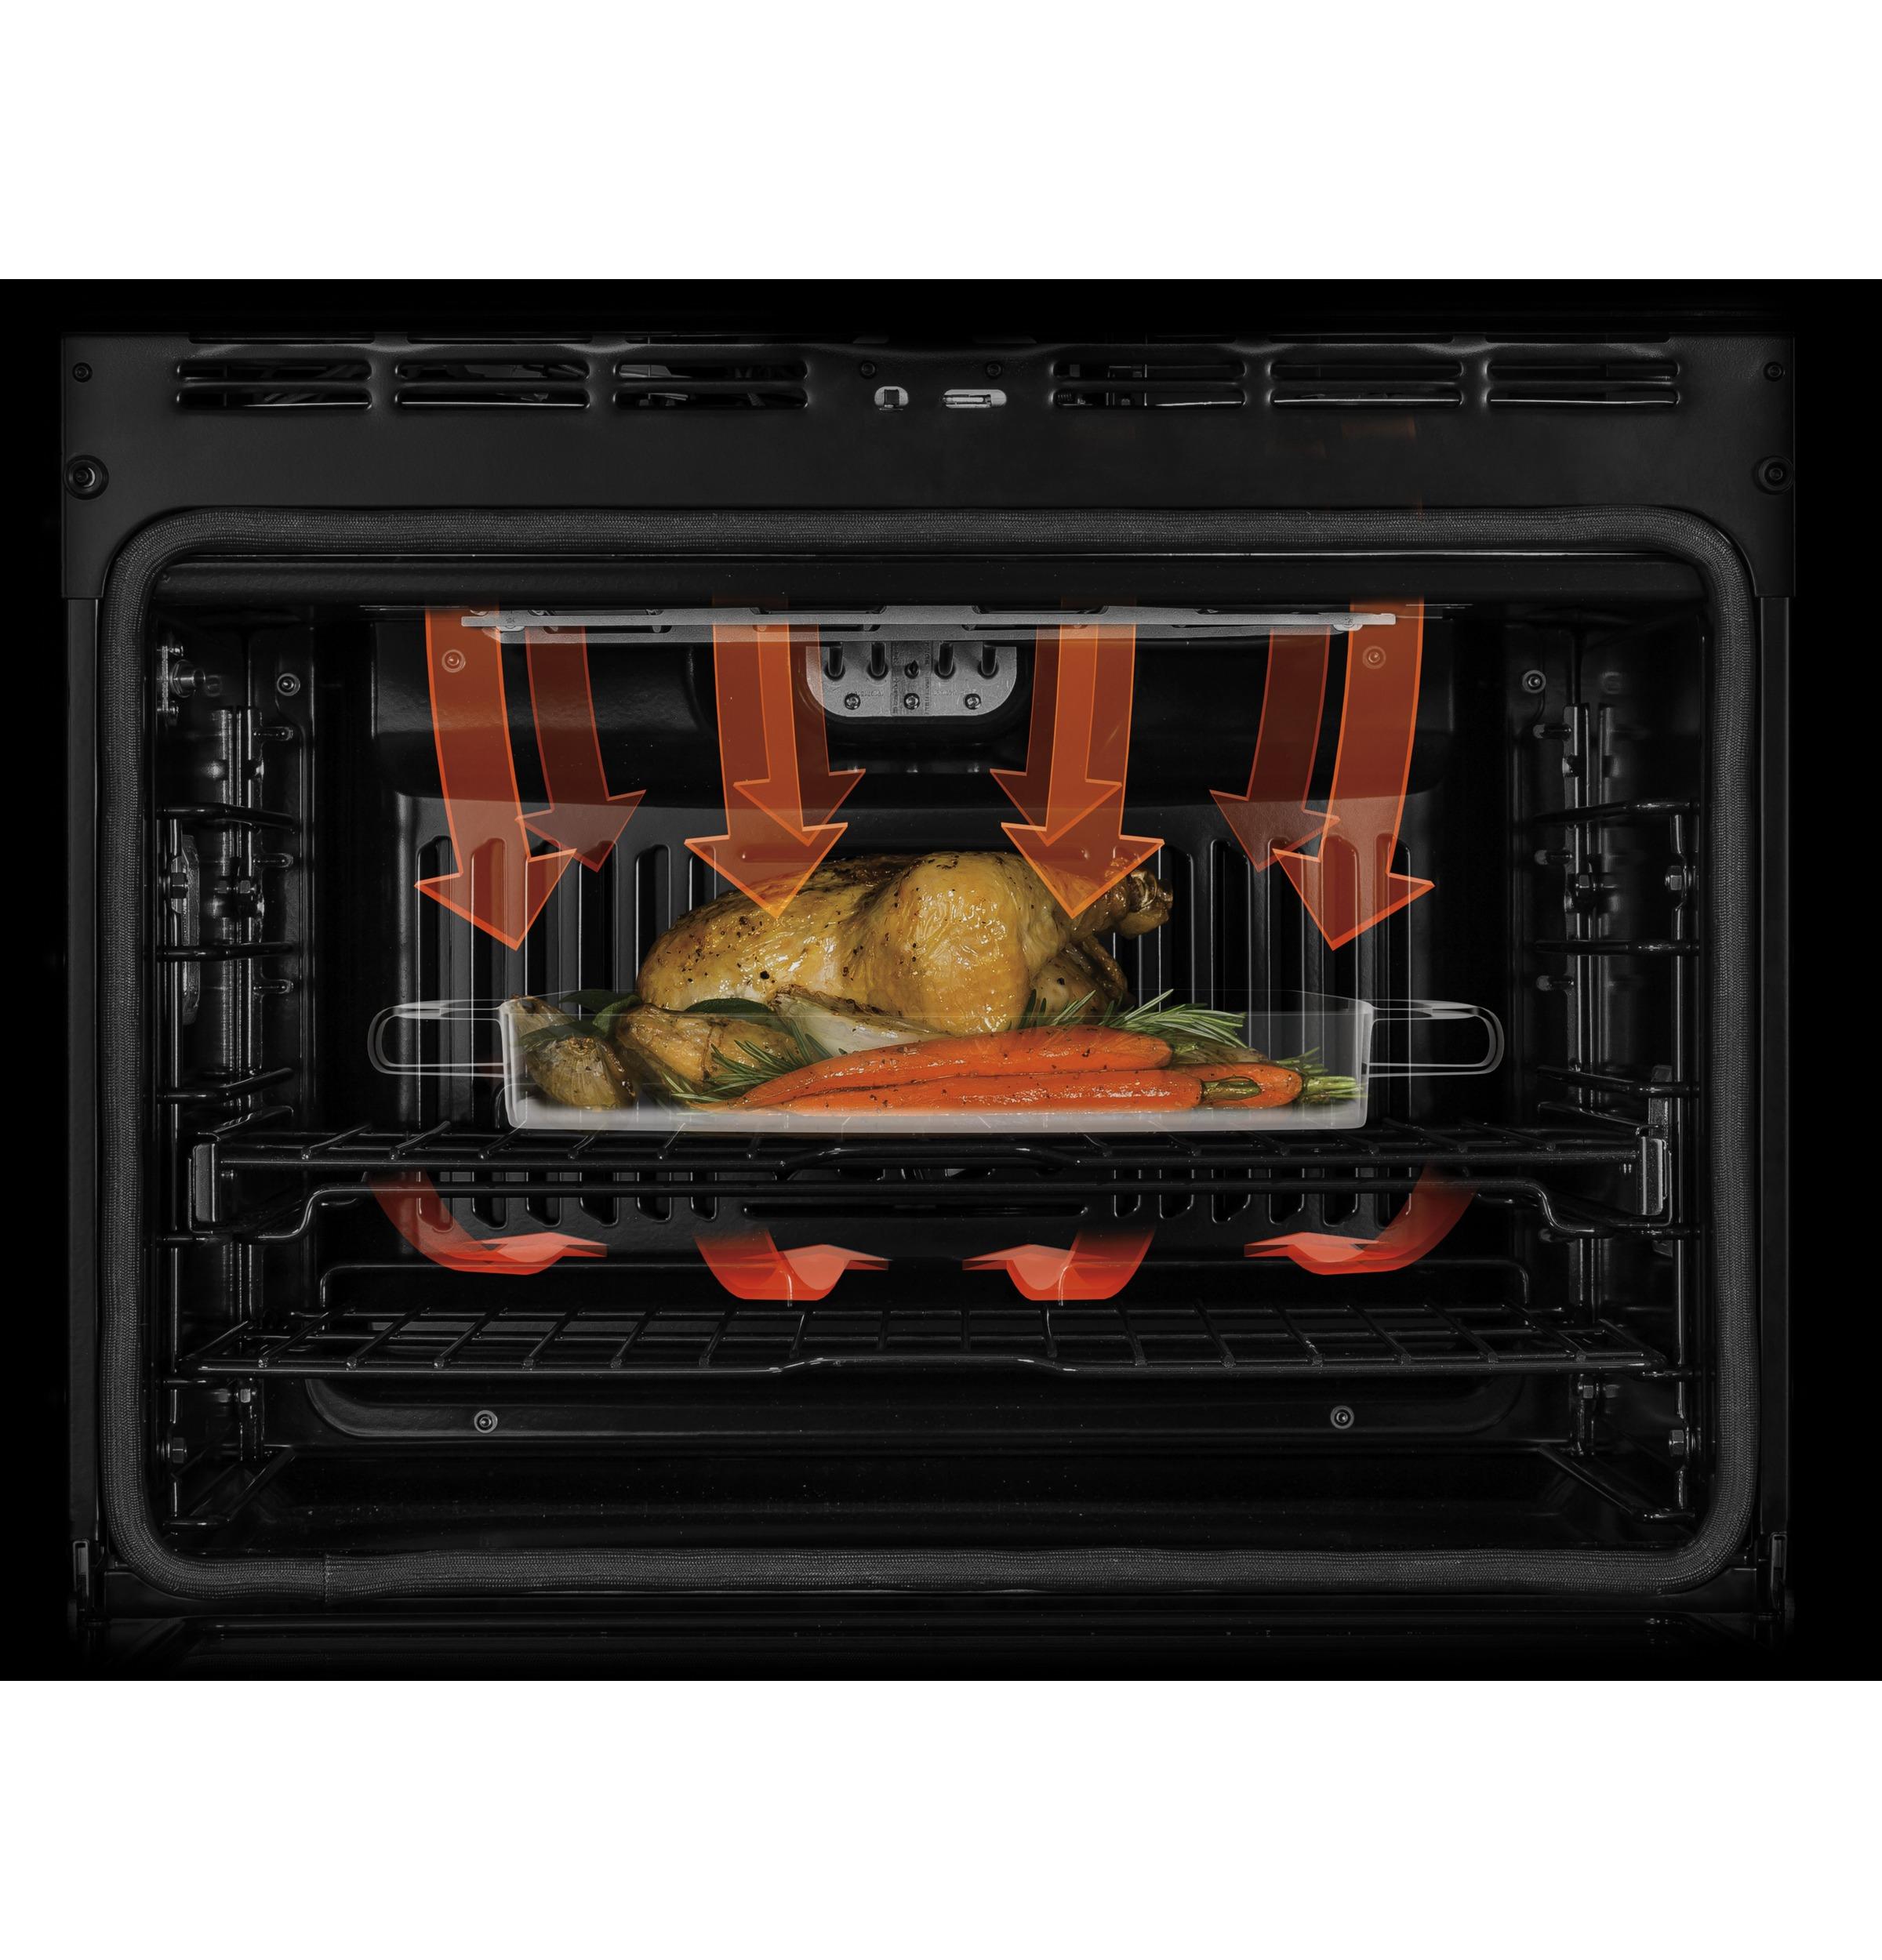 Model: CT9070SHSS | GE Café™ Series 30